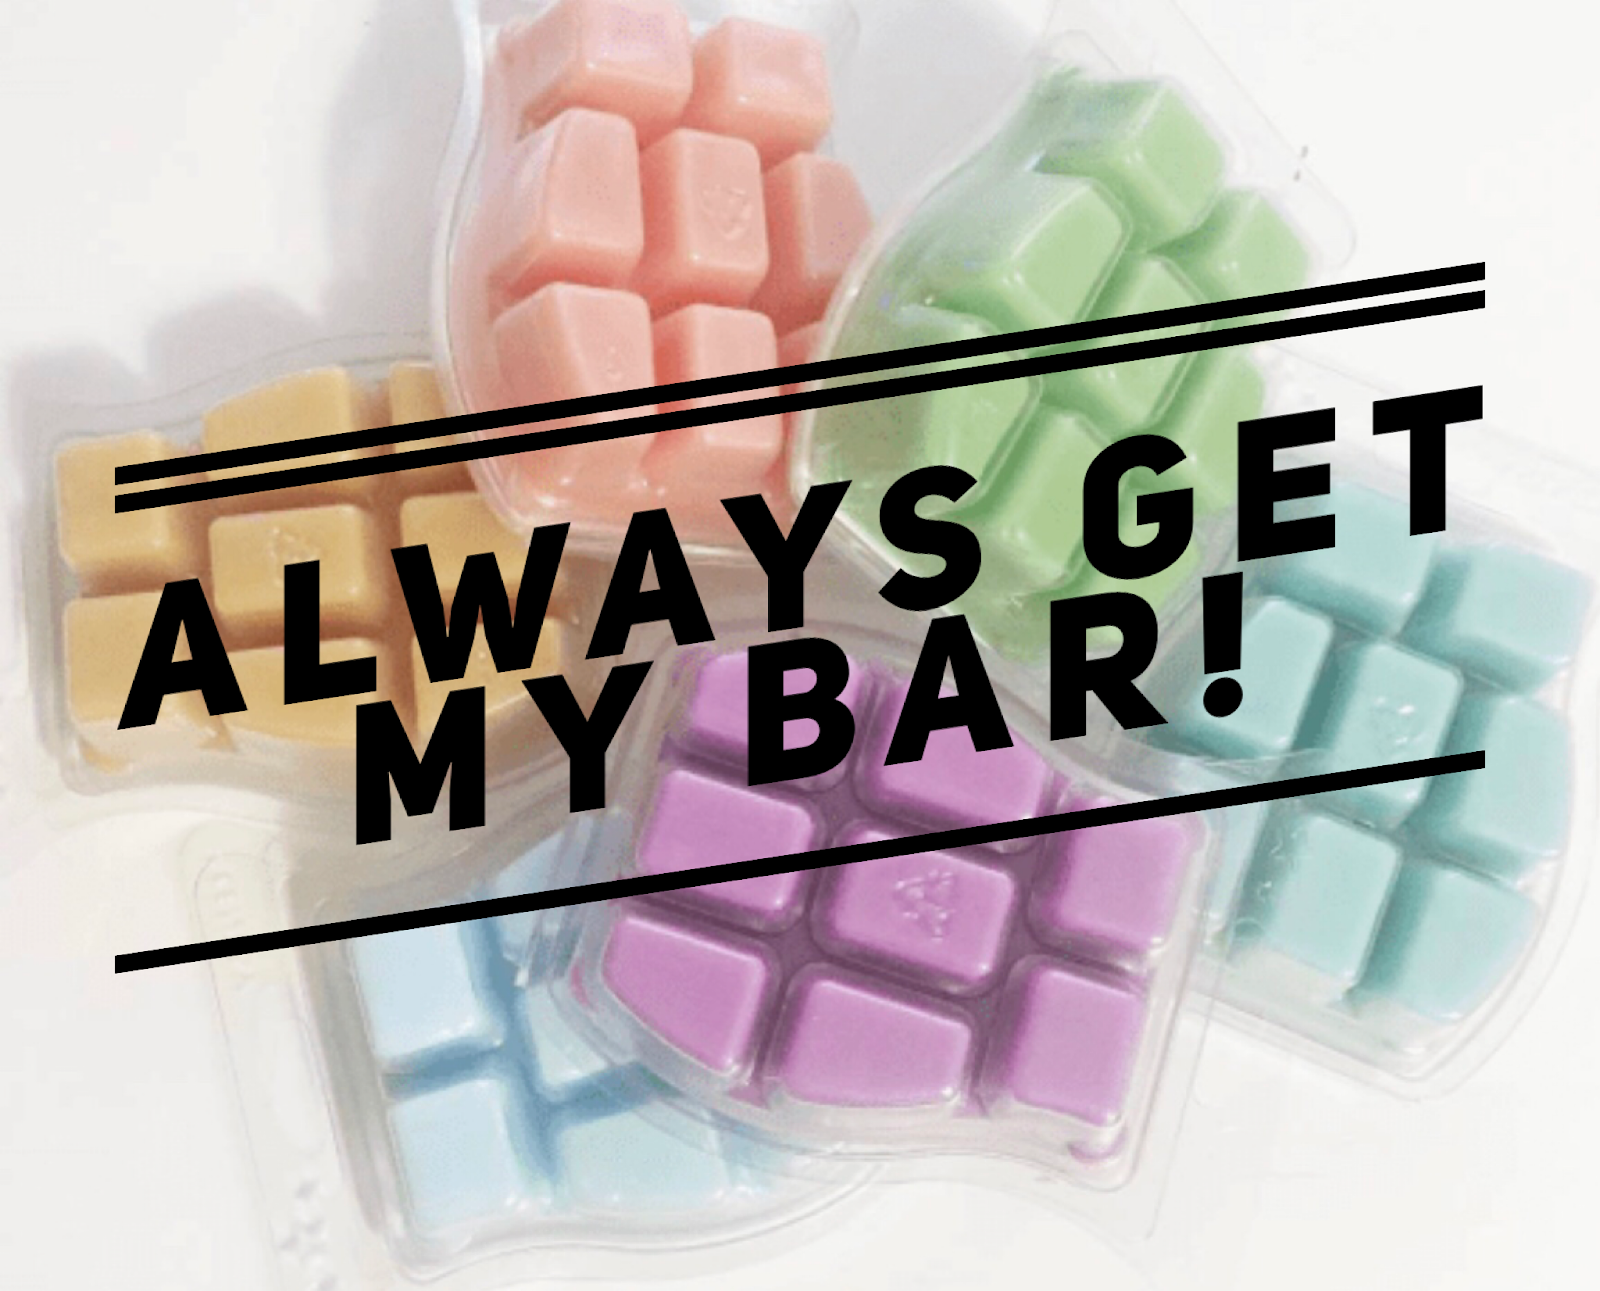 always get my bar scentsy